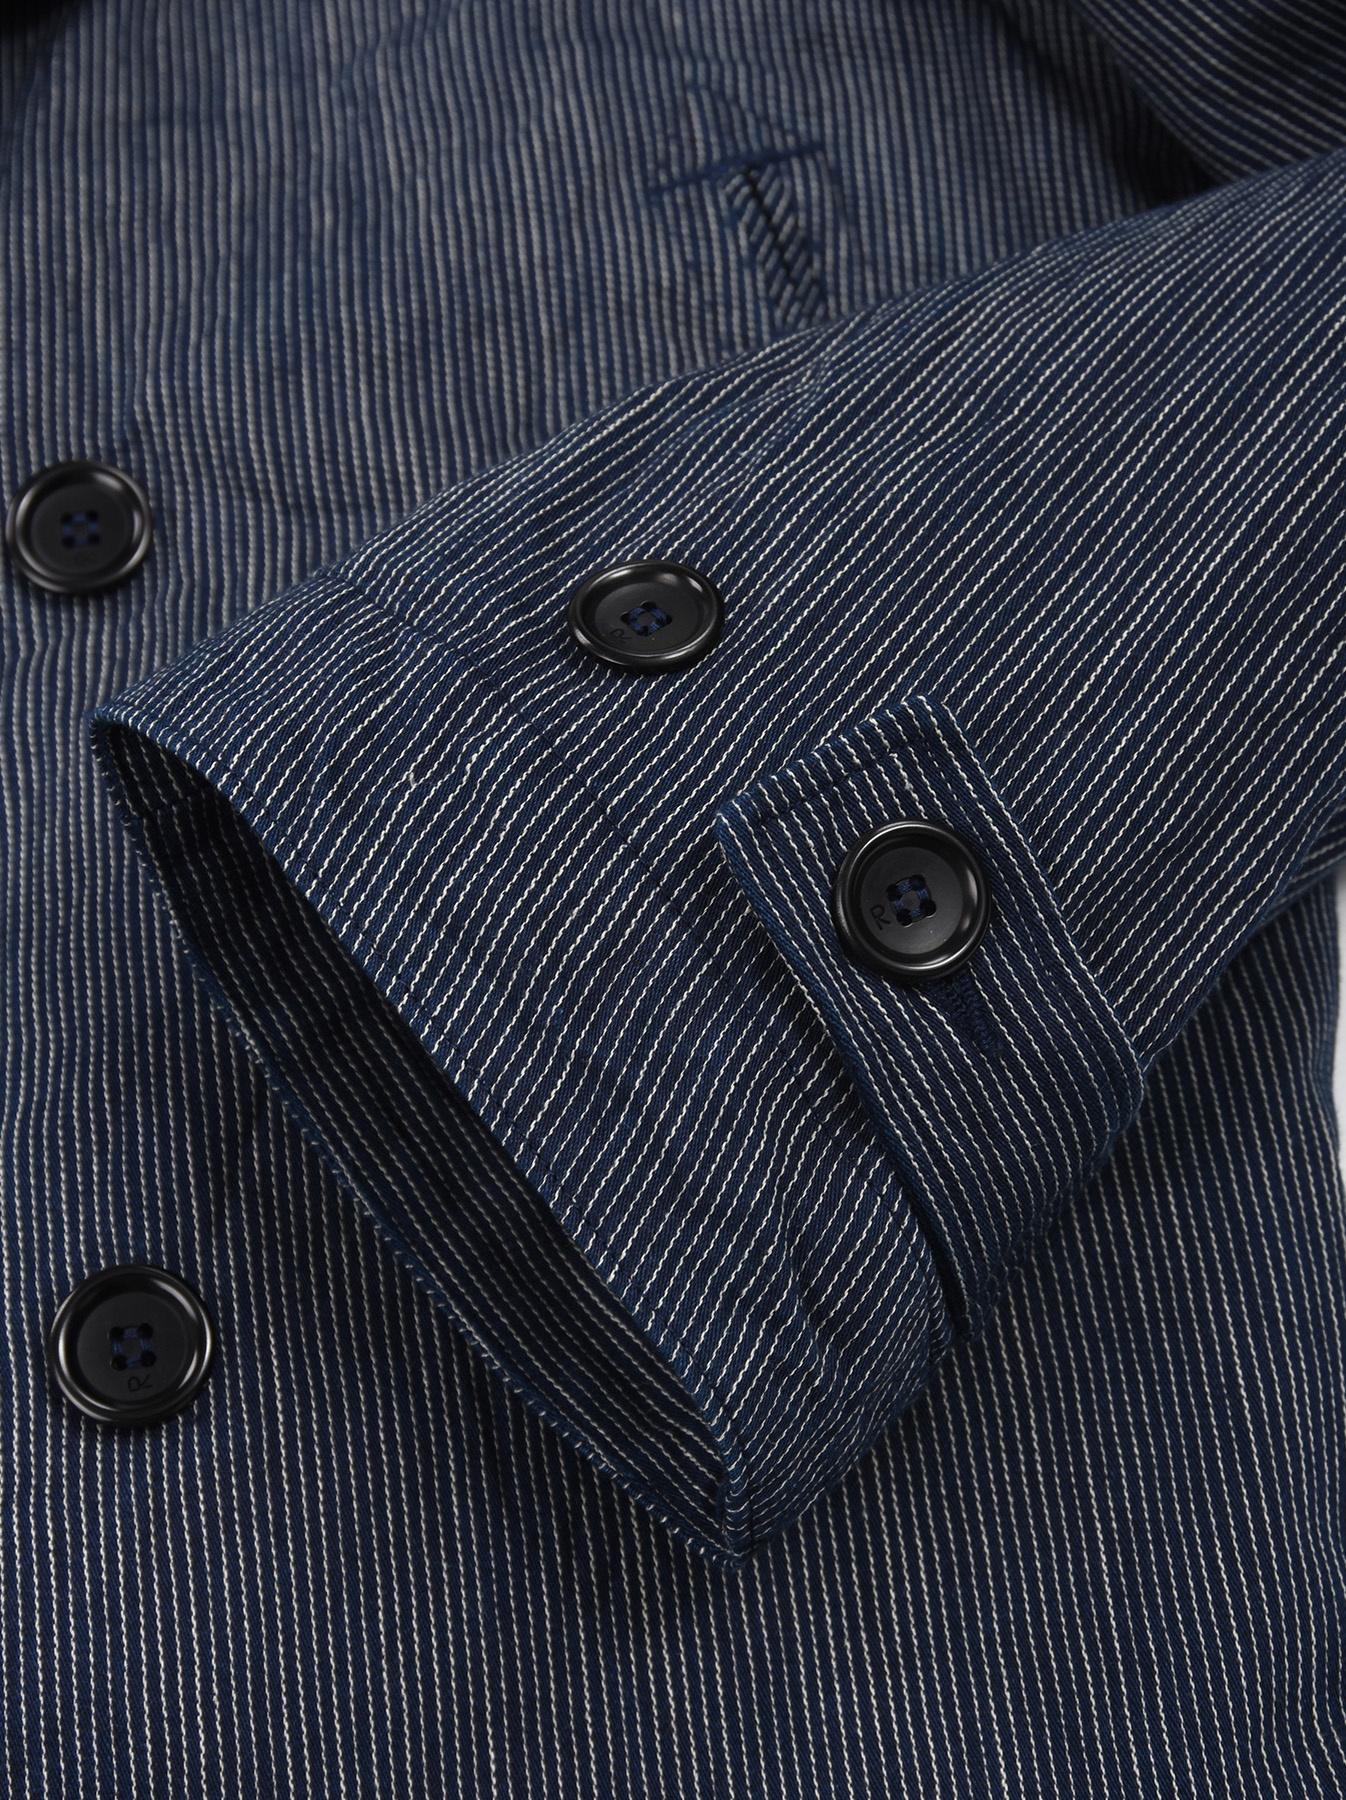 WH Indigo Mugi Yoko-shusi P-coat-11